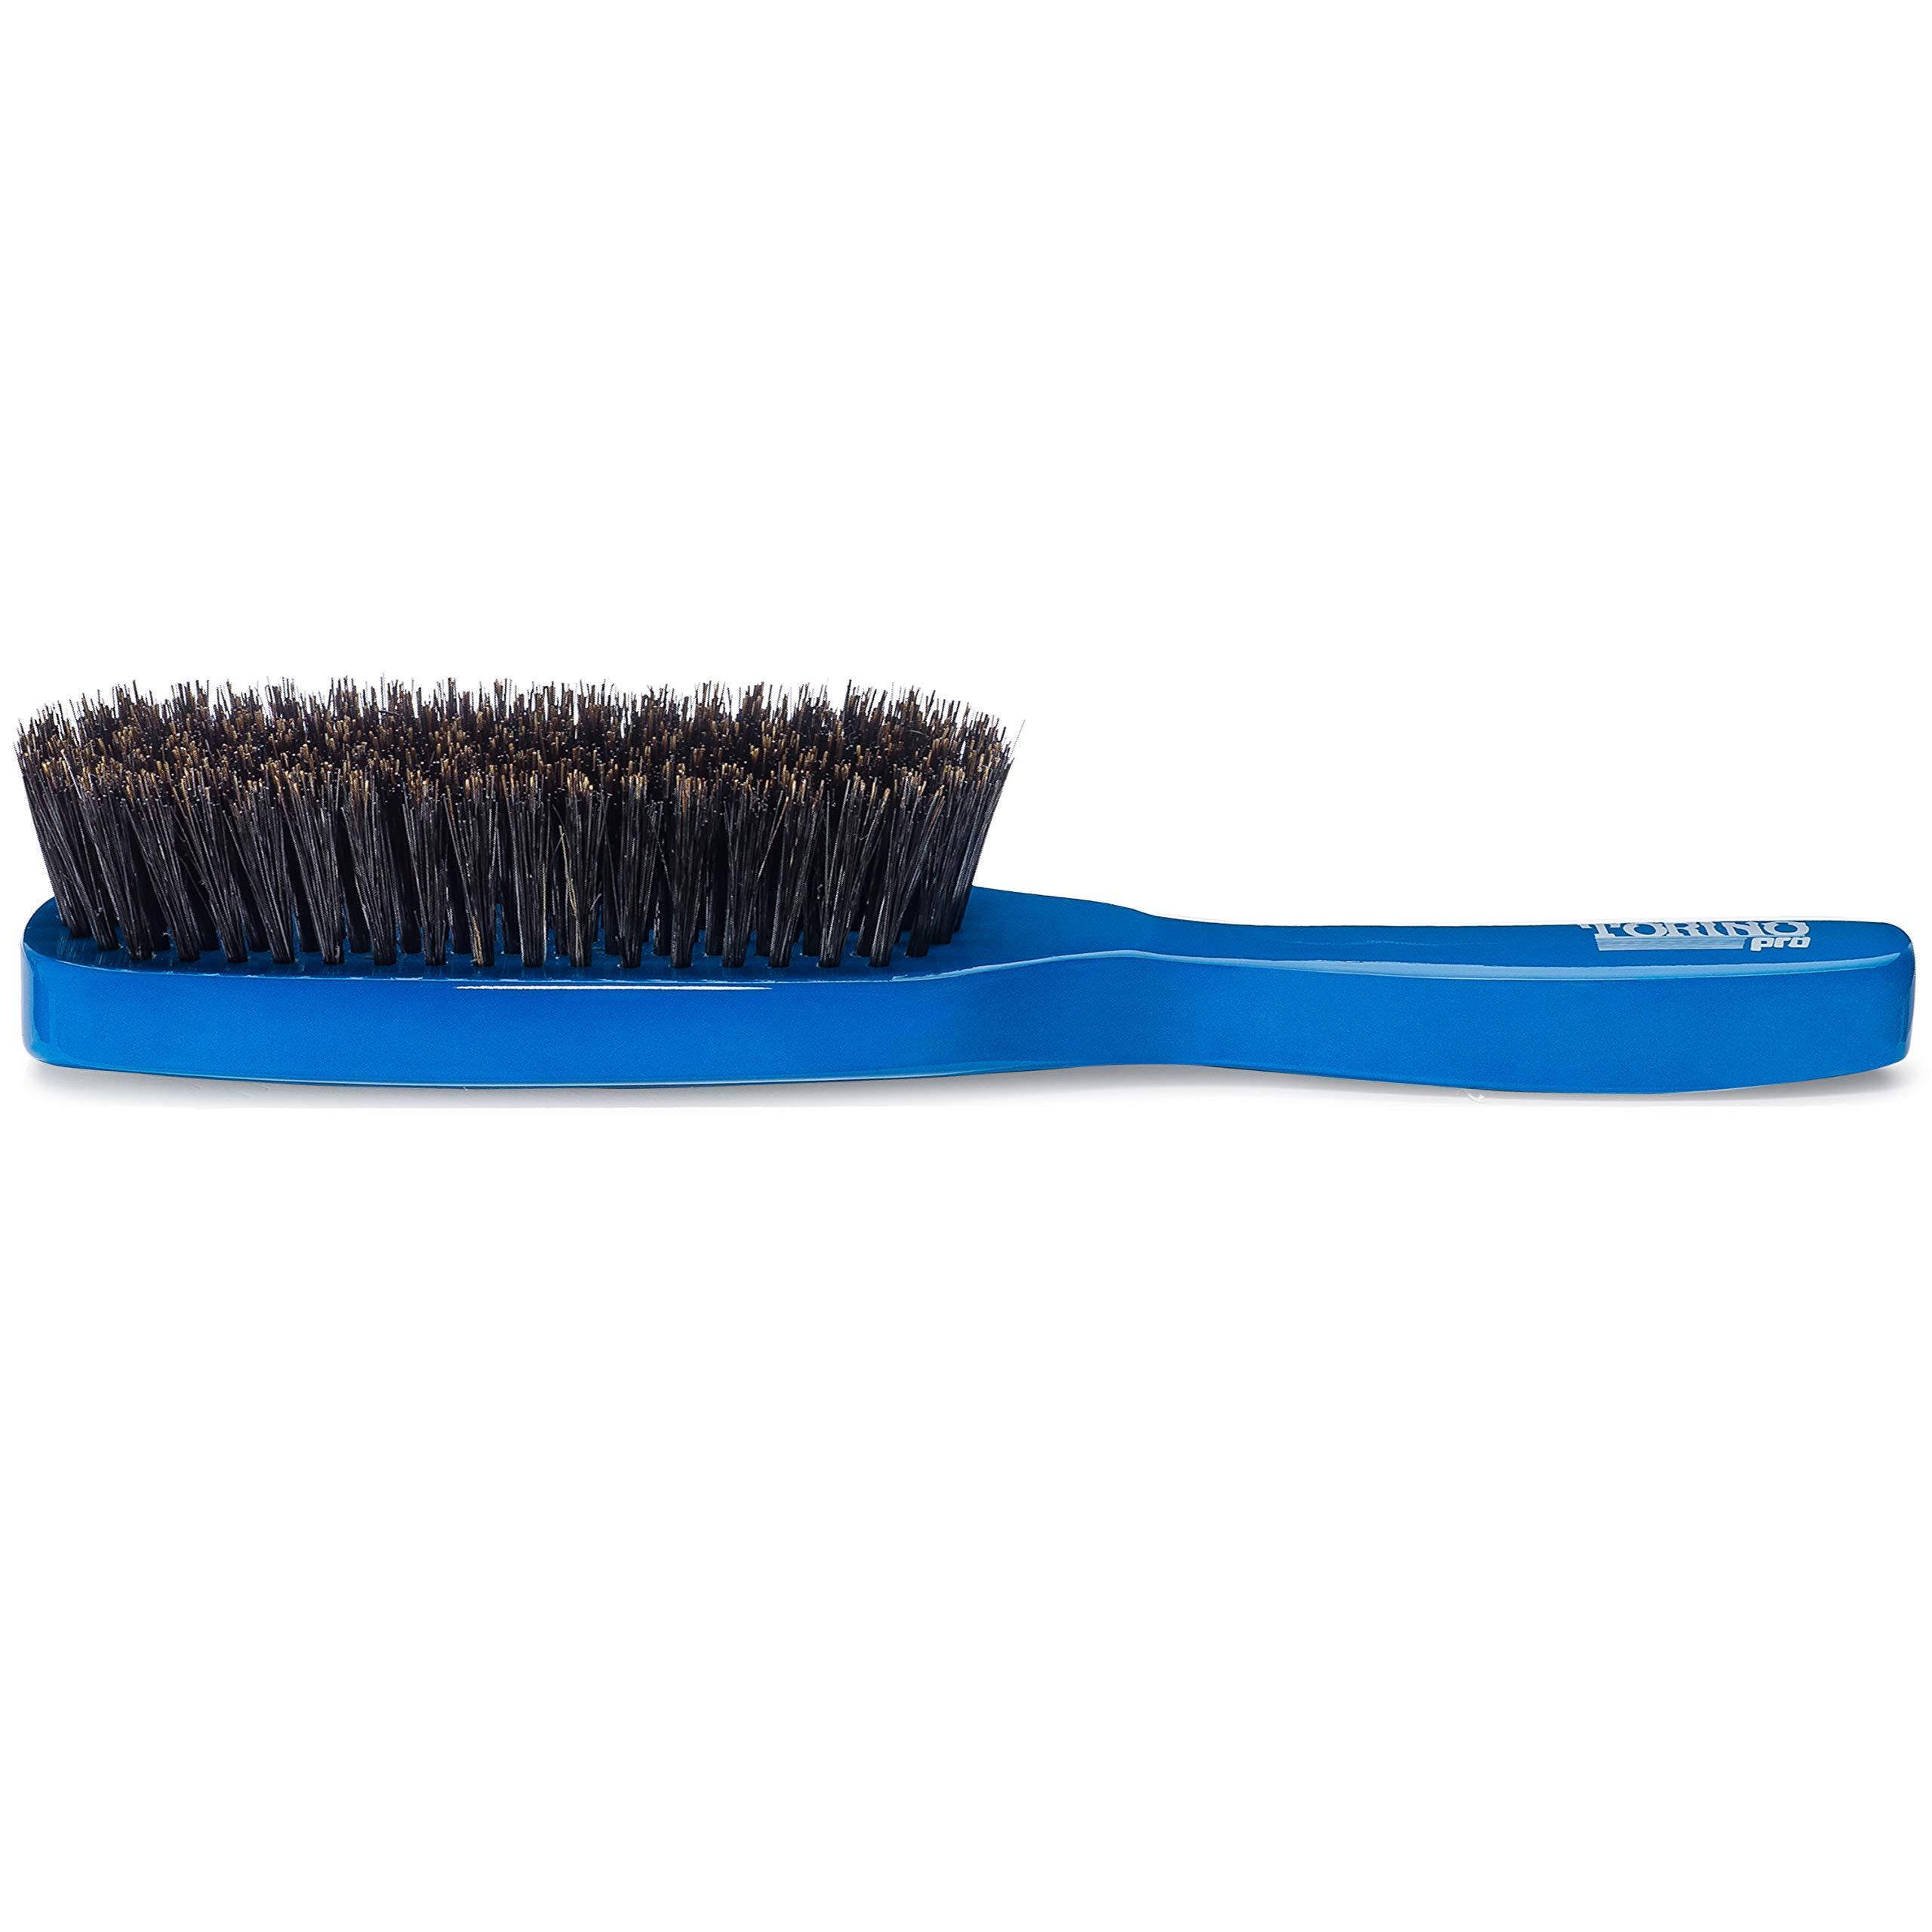 Torino Pro Medium Wave Brush By Brush King - #1850-8 Row Extra Long Bristles- Medium waves brush - Great pull - Great for connections - for 360 waves by TORINO PRO WAVE BRUSHES BY BRUSH KING (Image #5)